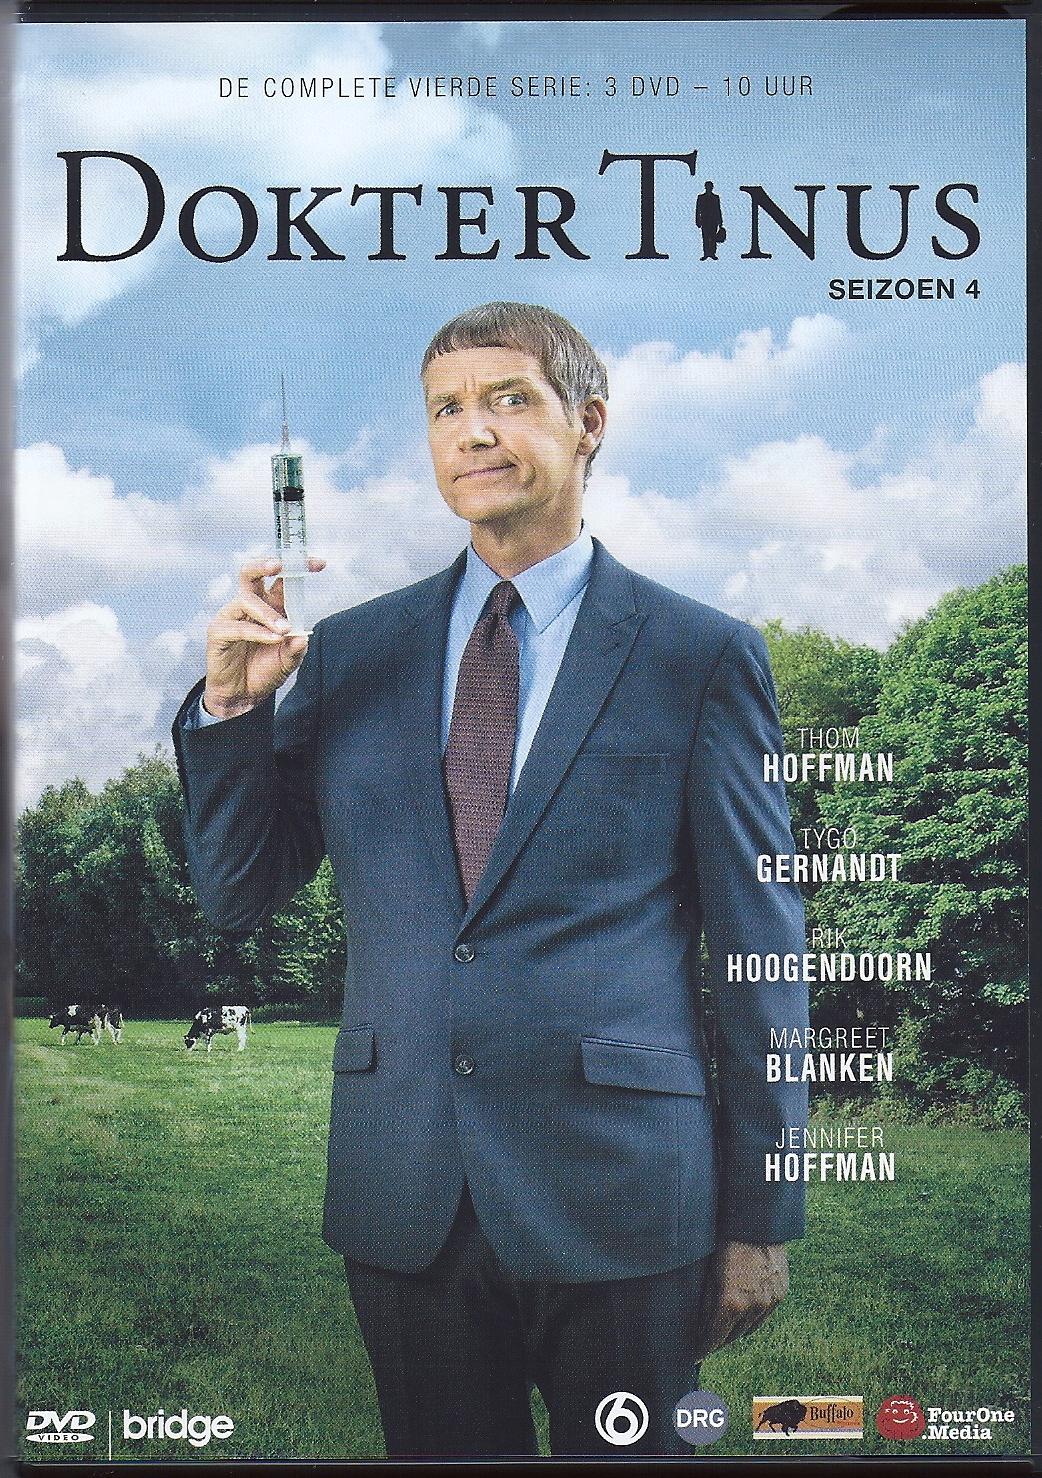 DVD-015 Dokter Tinus seizoen 4